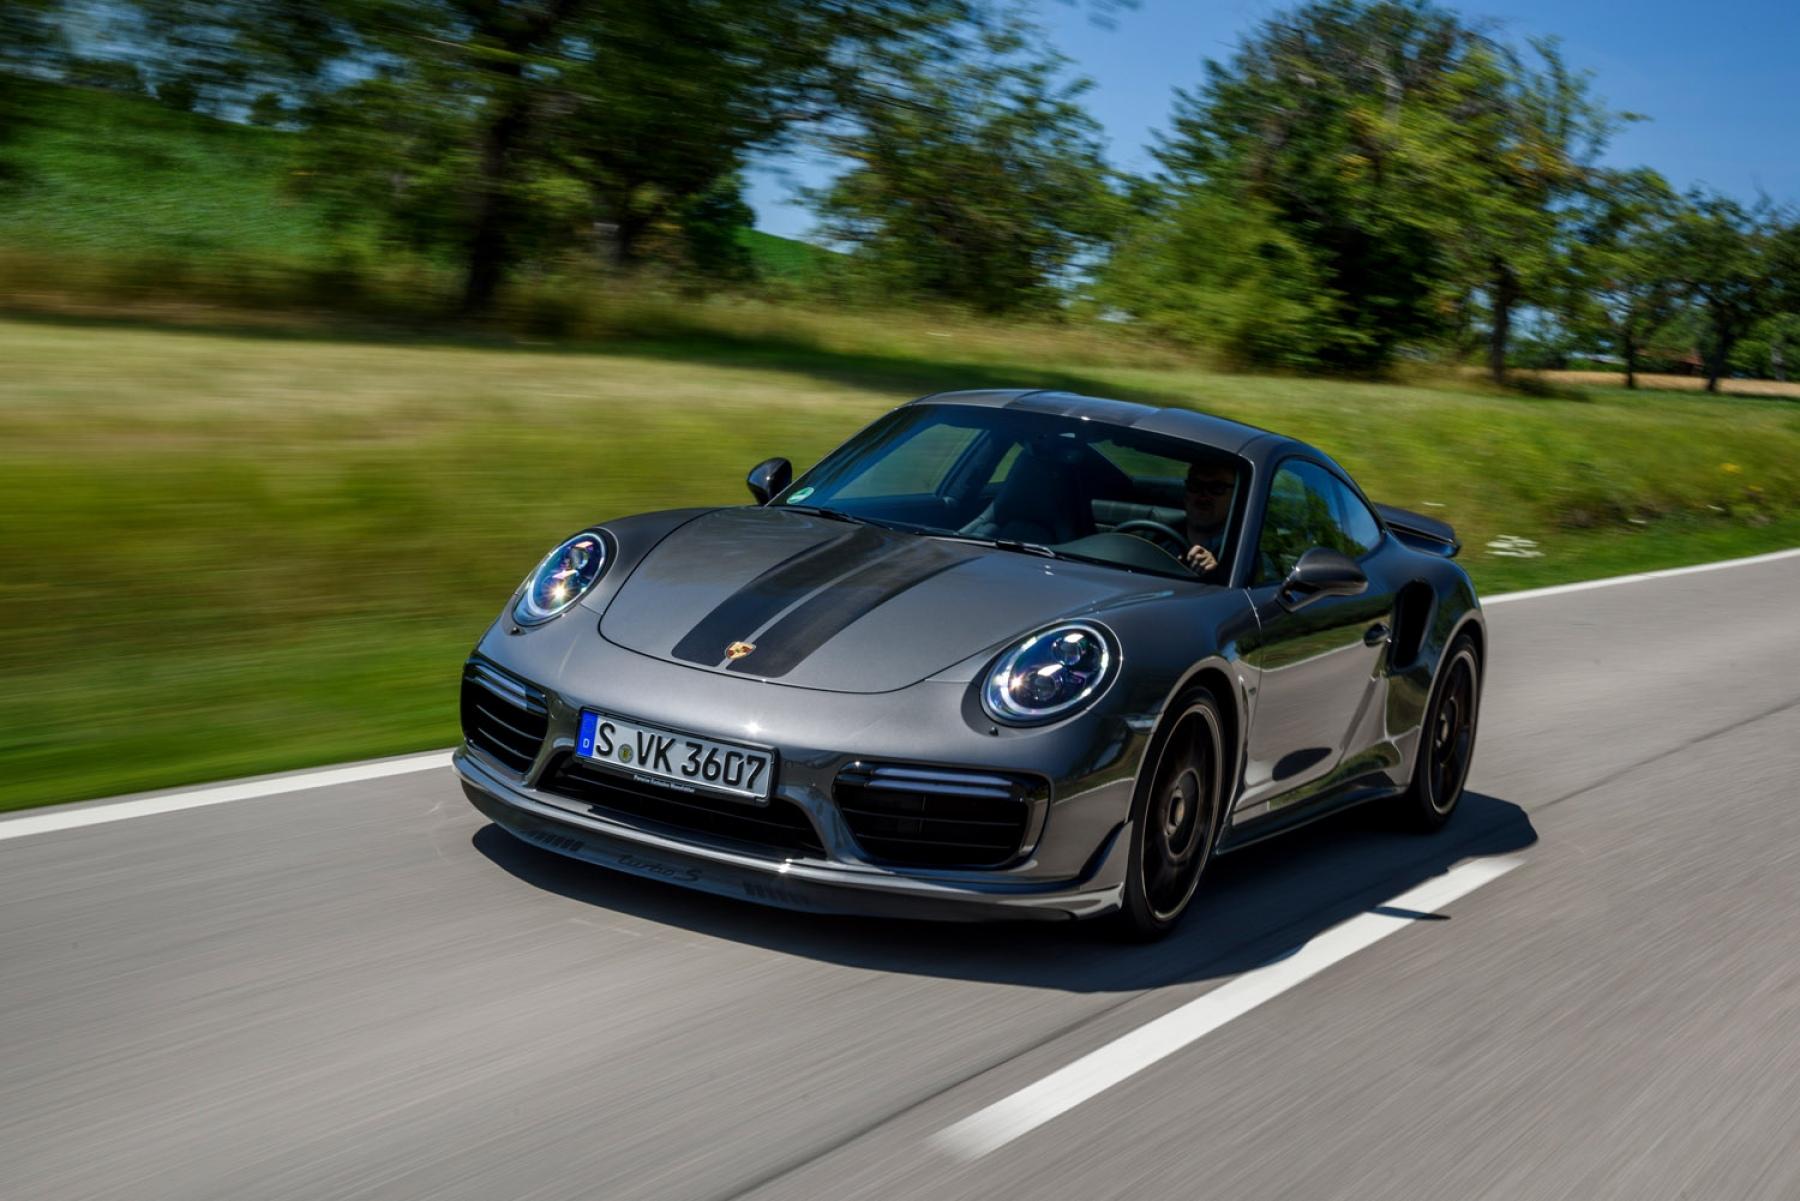 911 Turbo S Exclusive Series Agate Grey Metallic Porsche